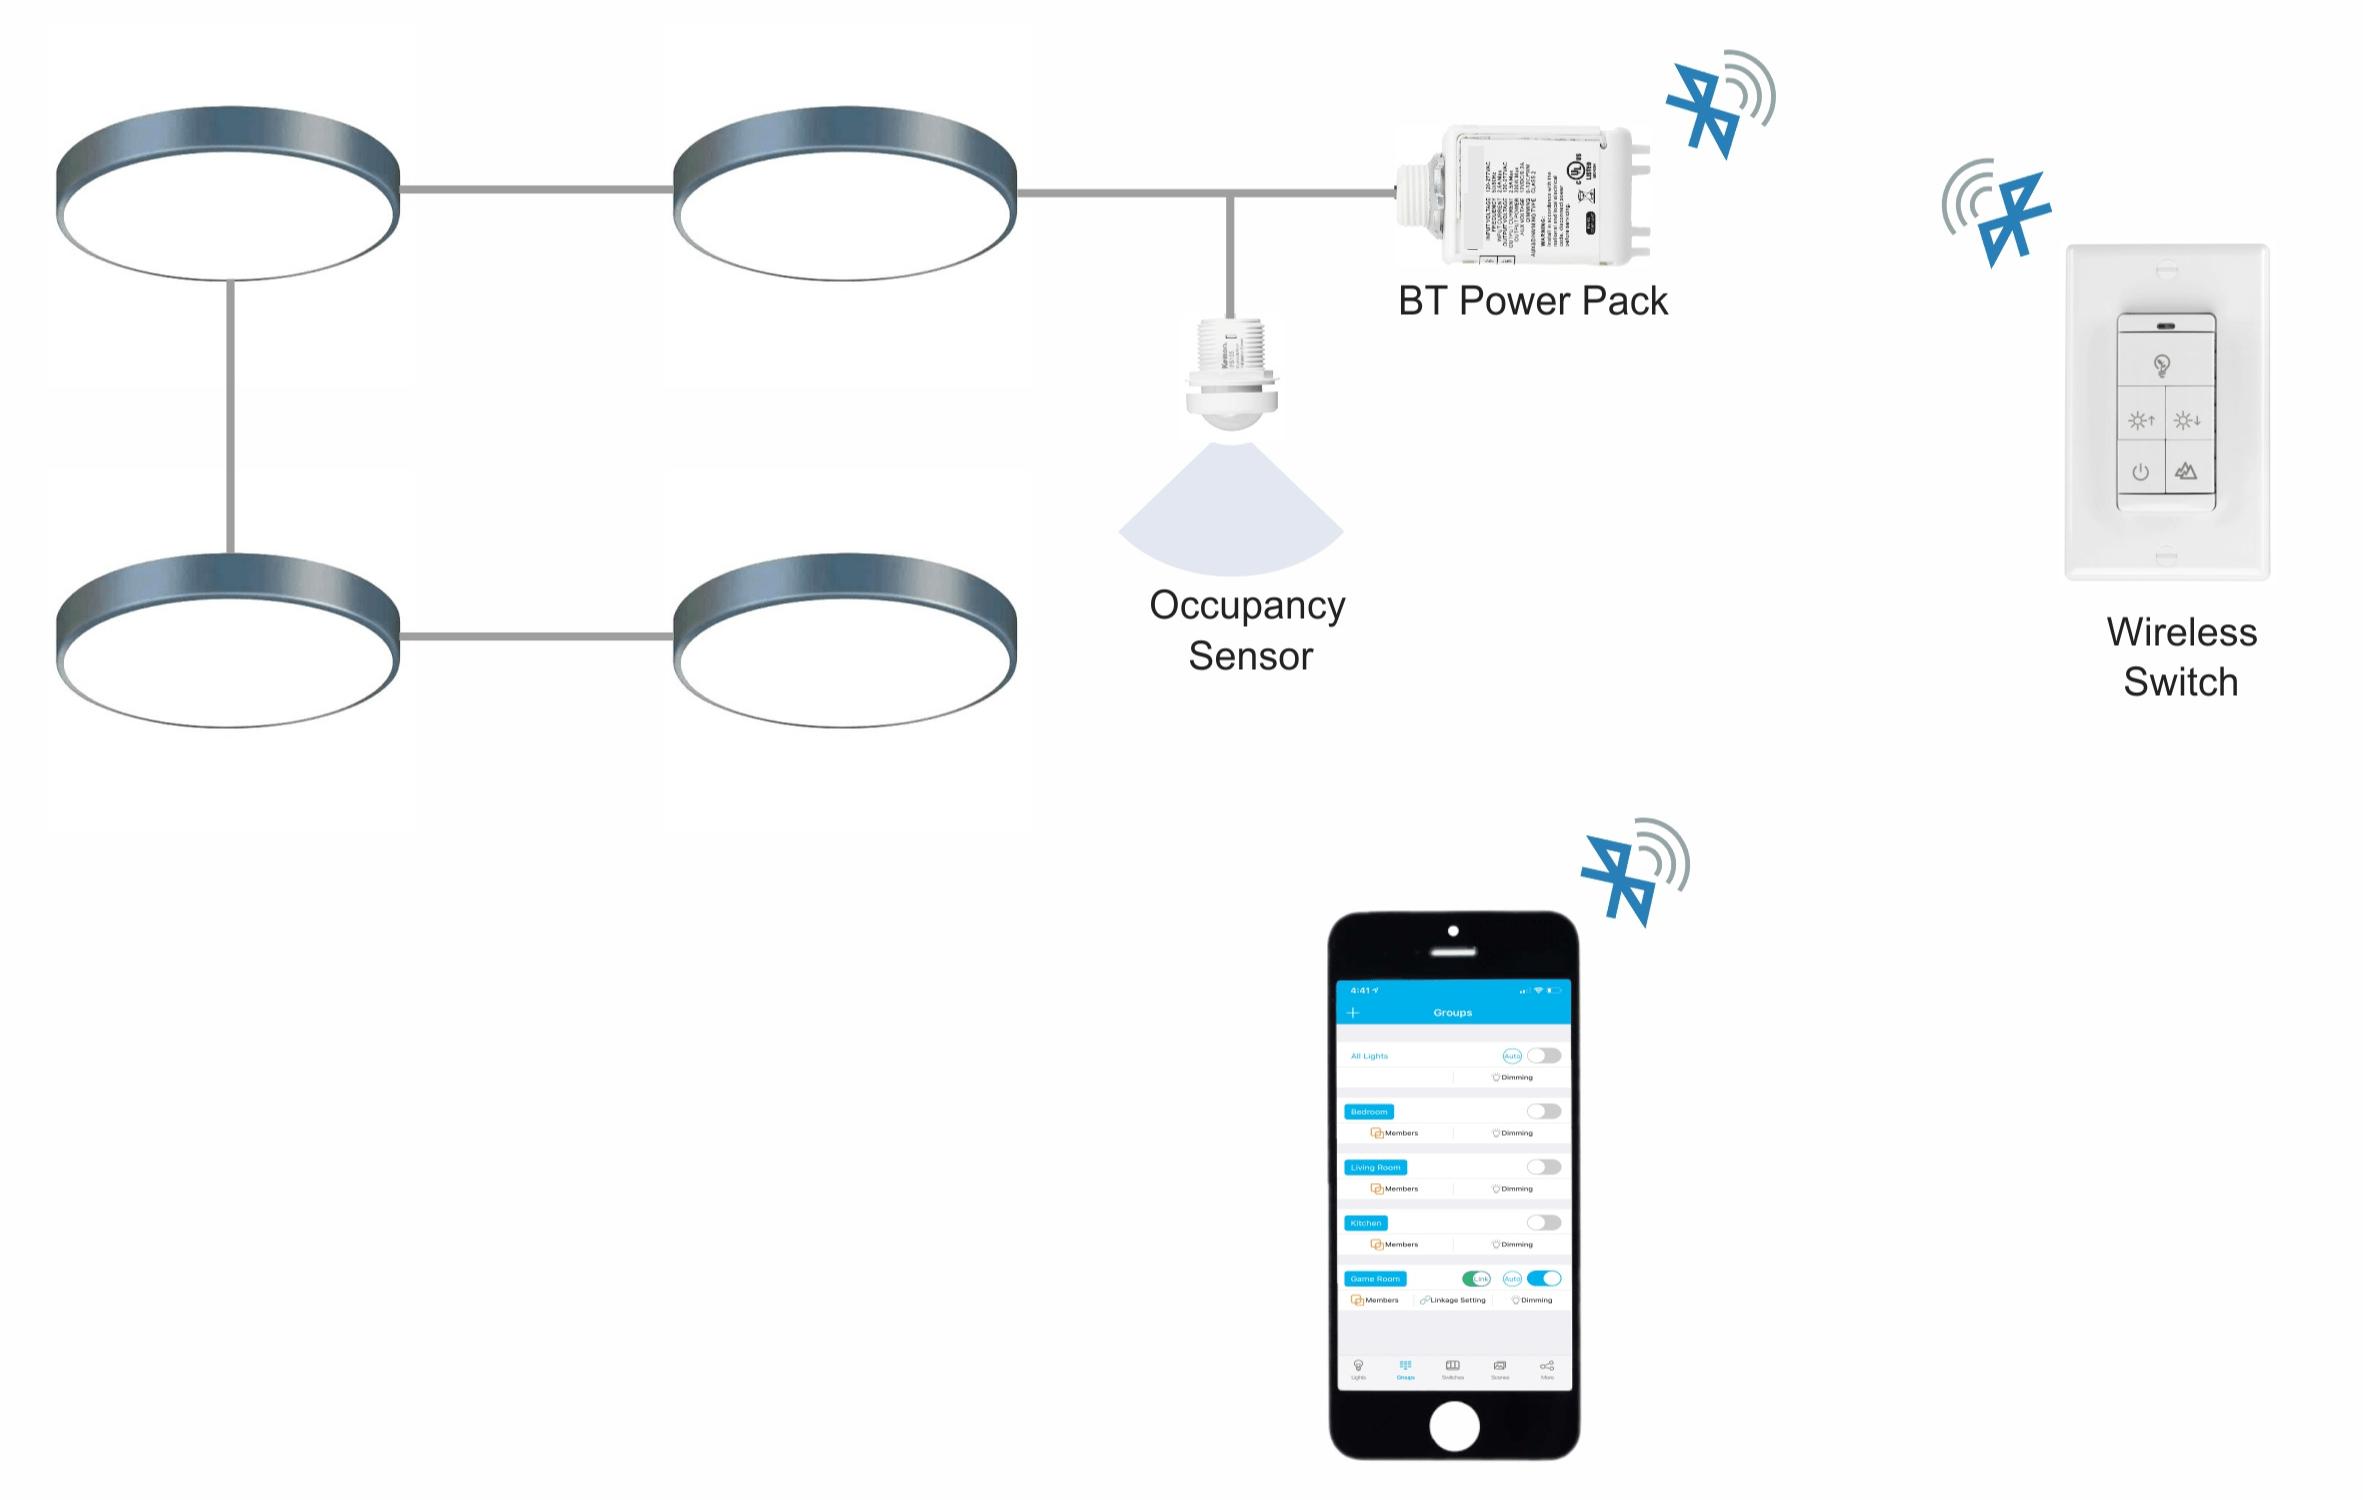 Illumra Bluetooth Lighting Diagram 2